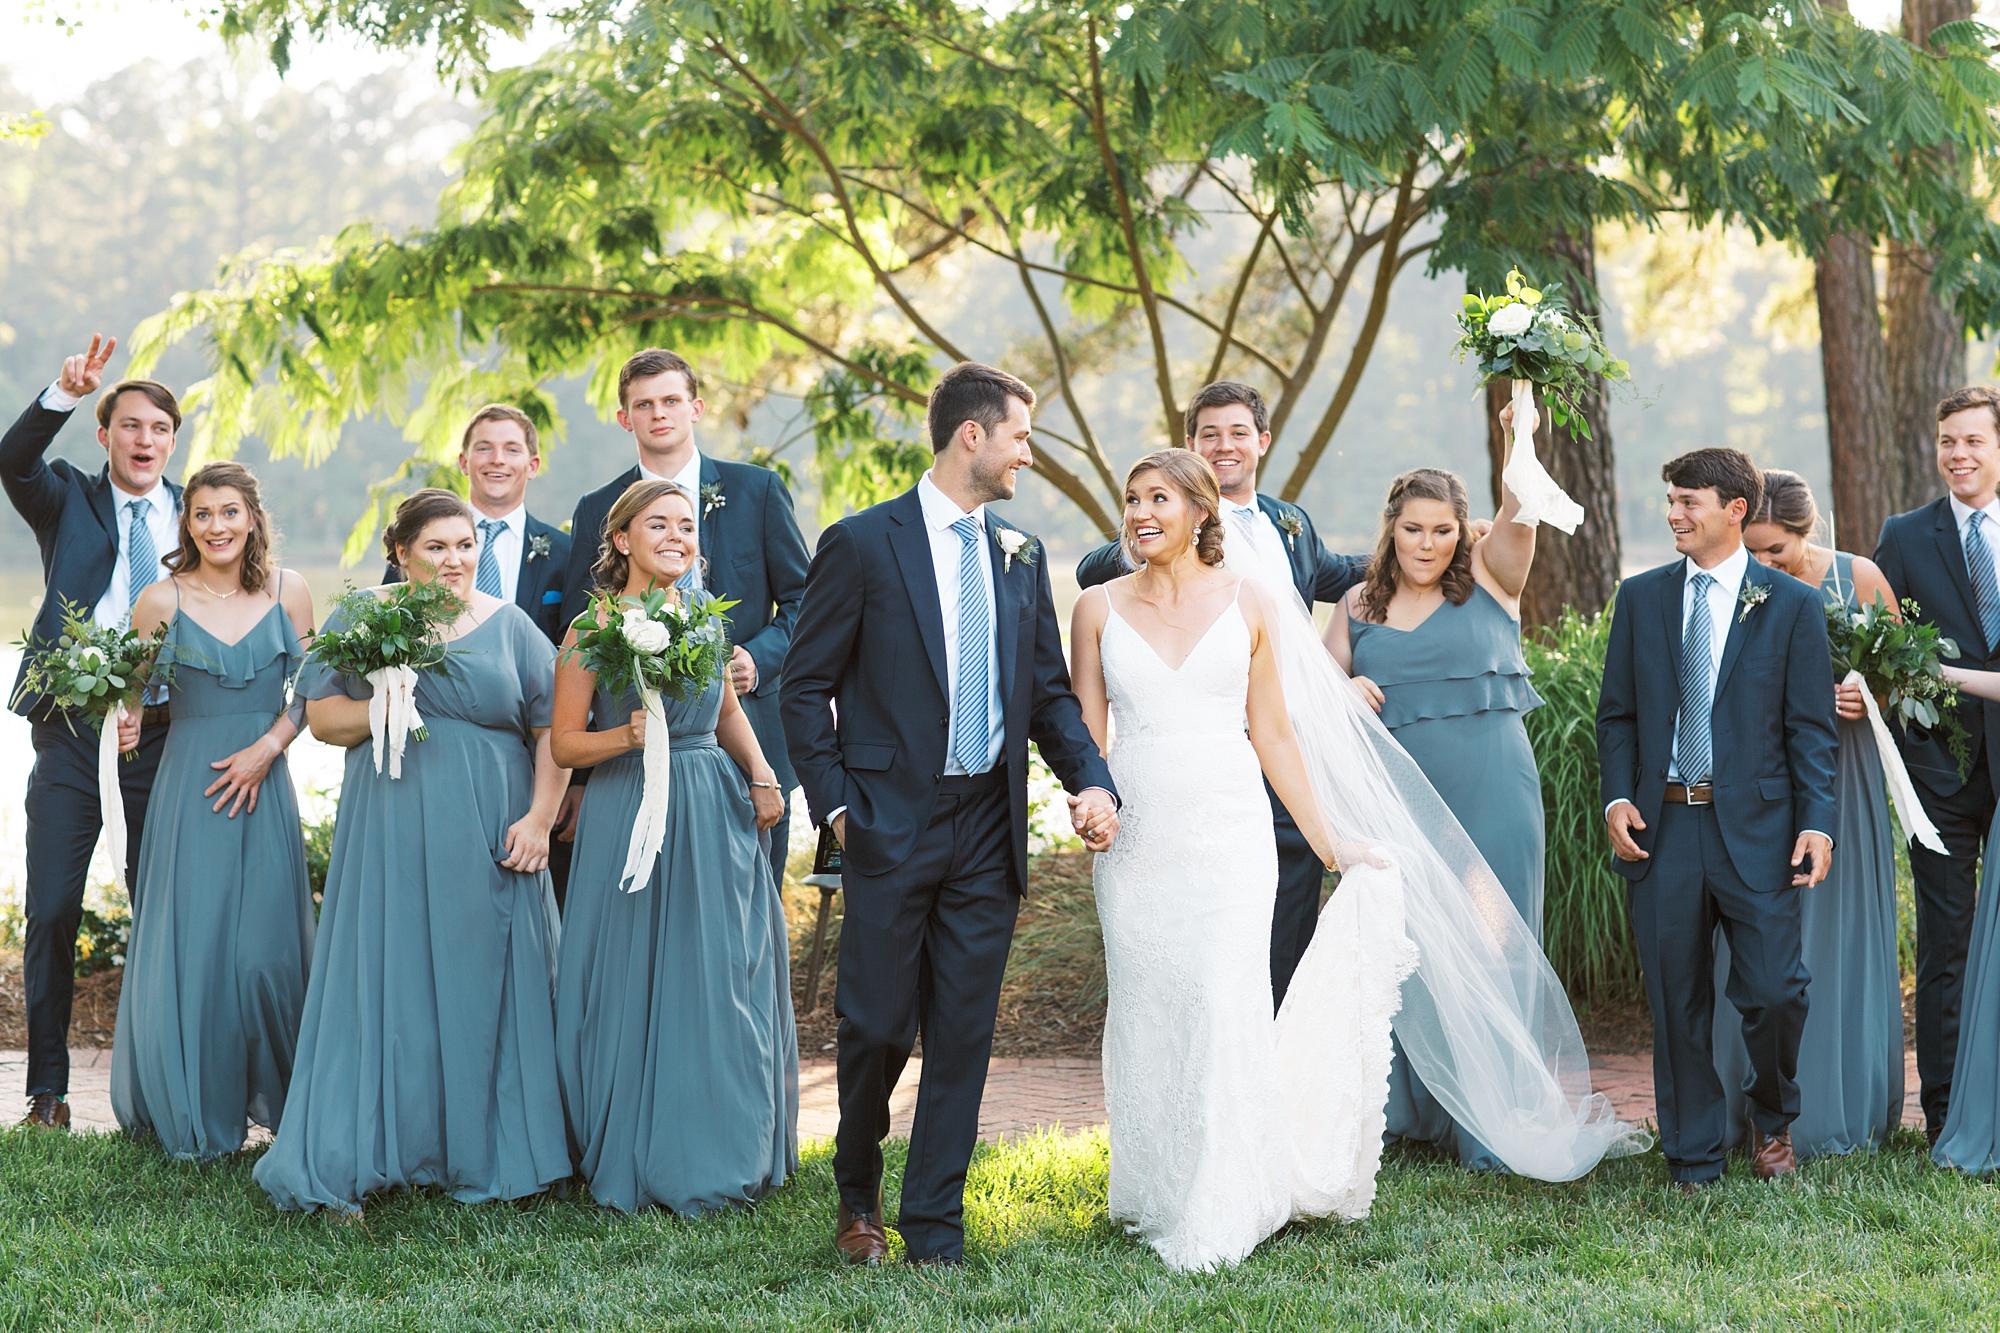 Angus-Barn-Pavilion-Raleigh-Wedding-Film-Photographer_0157.jpg